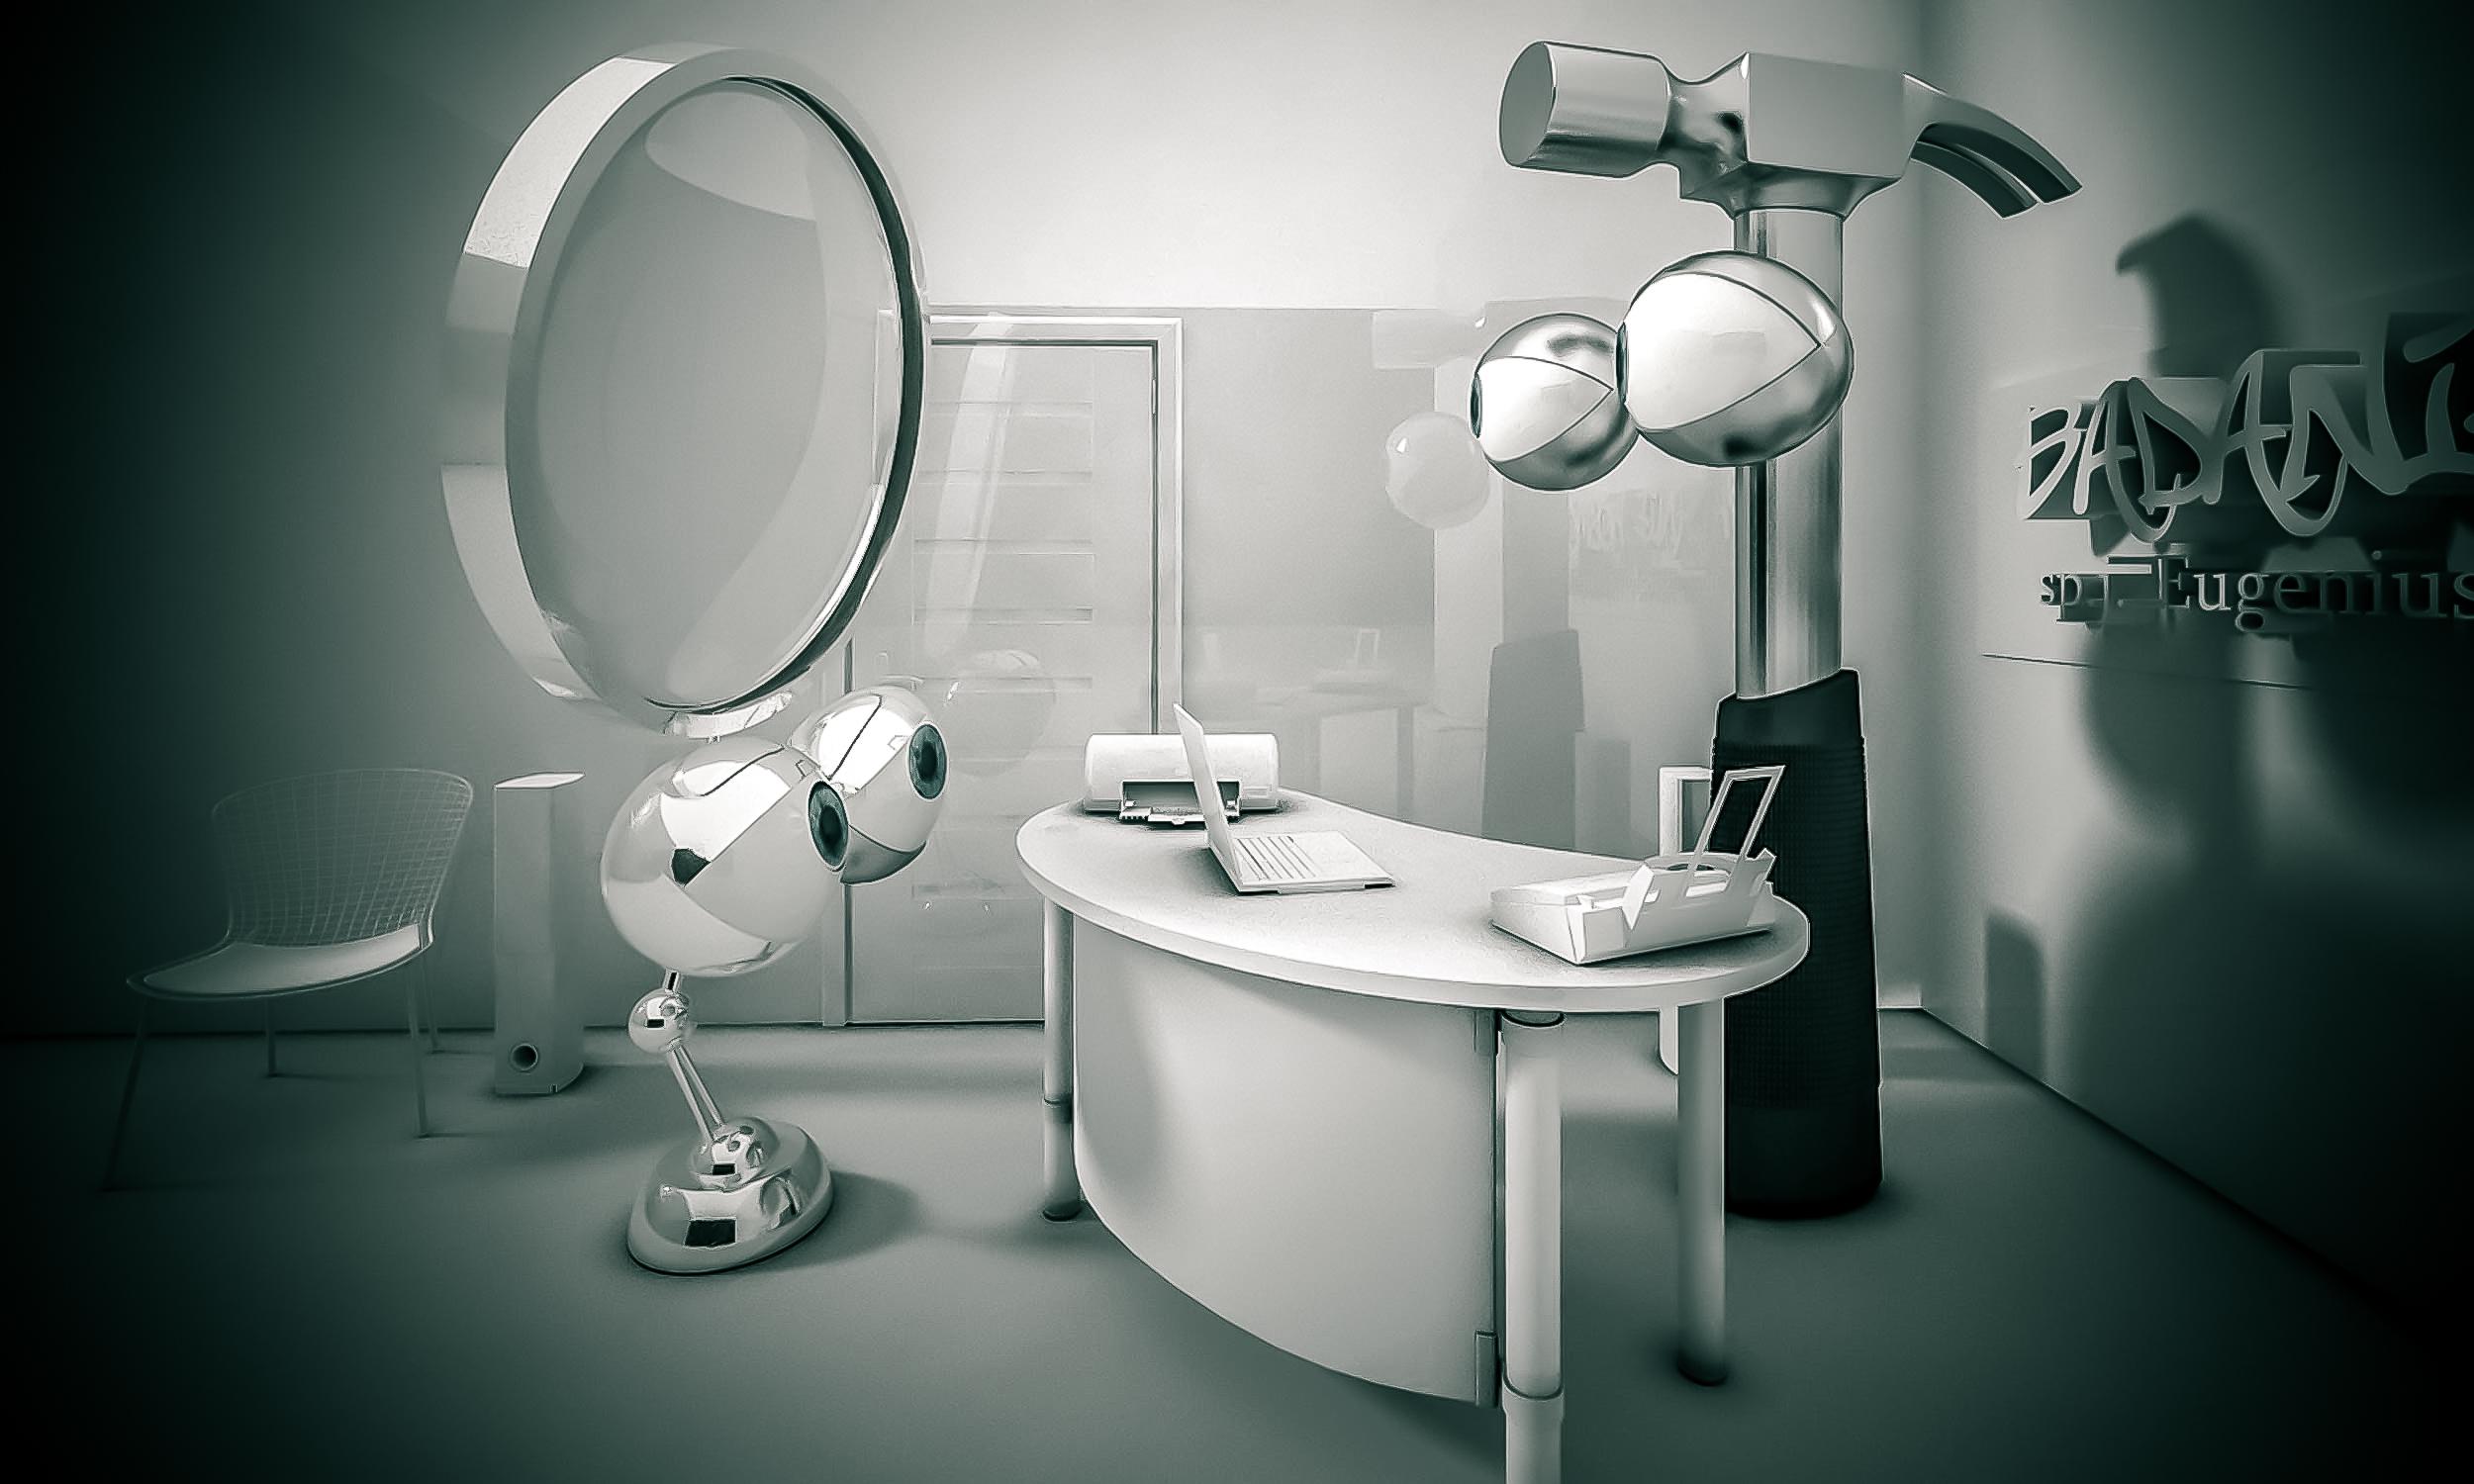 artur-klamut-rendering-ligtroom-presets-2